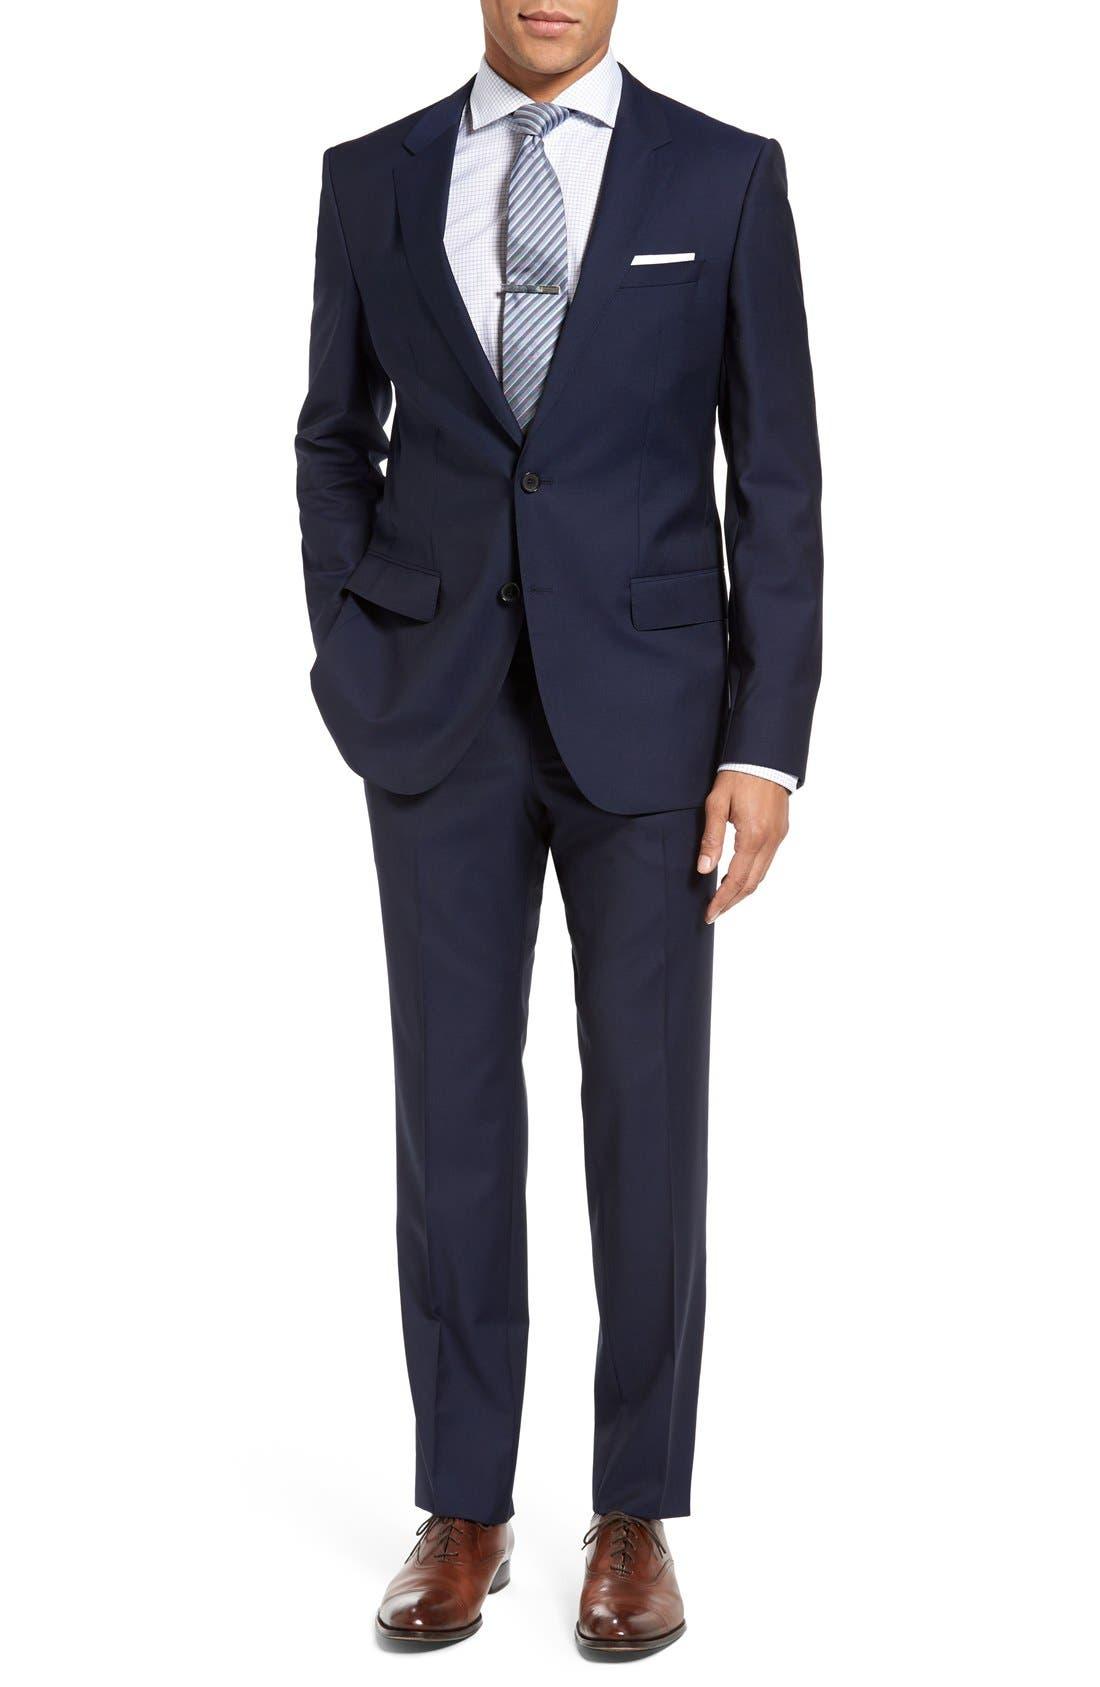 Huge/Genius Trim Fit Navy Wool Suit,                             Main thumbnail 1, color,                             NAVY